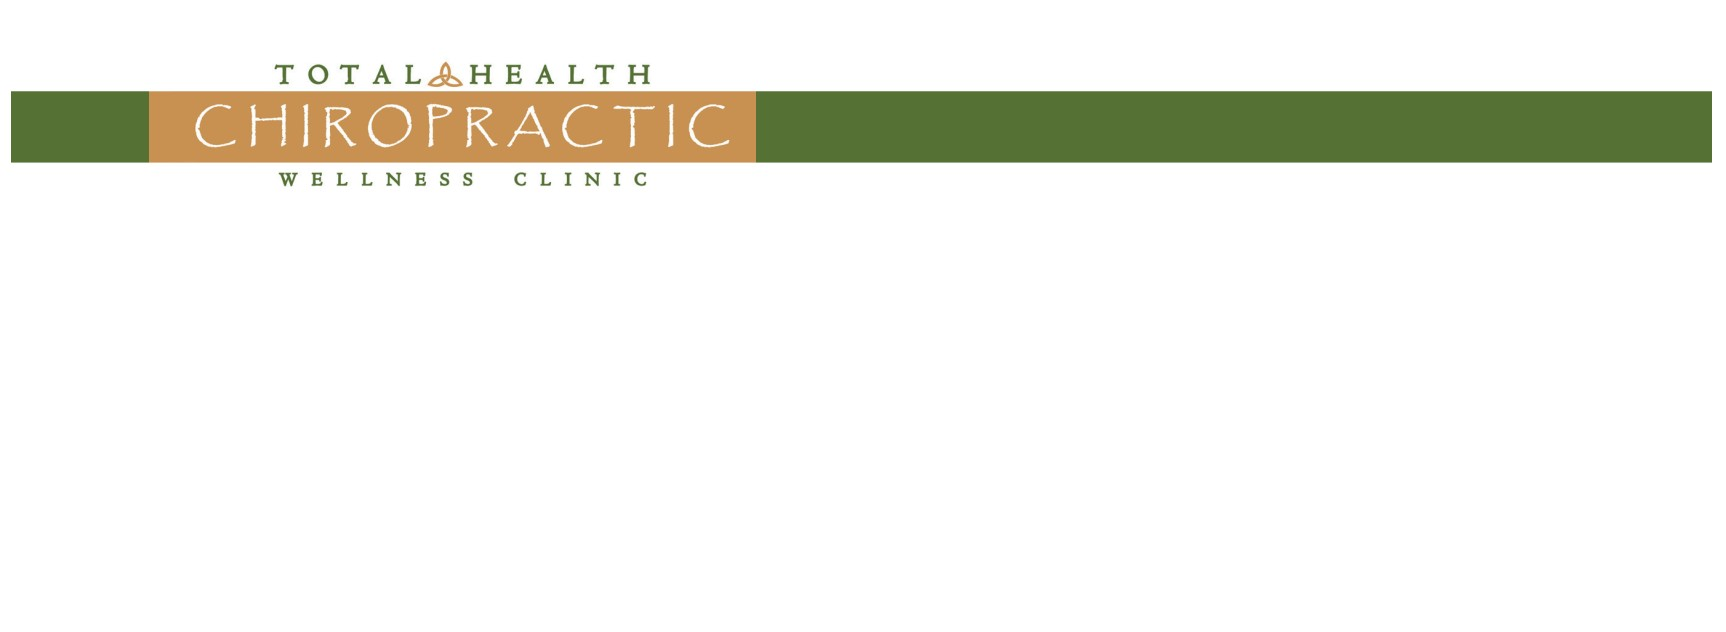 Total Health Chiropractic Wellness Clinic Linkedin